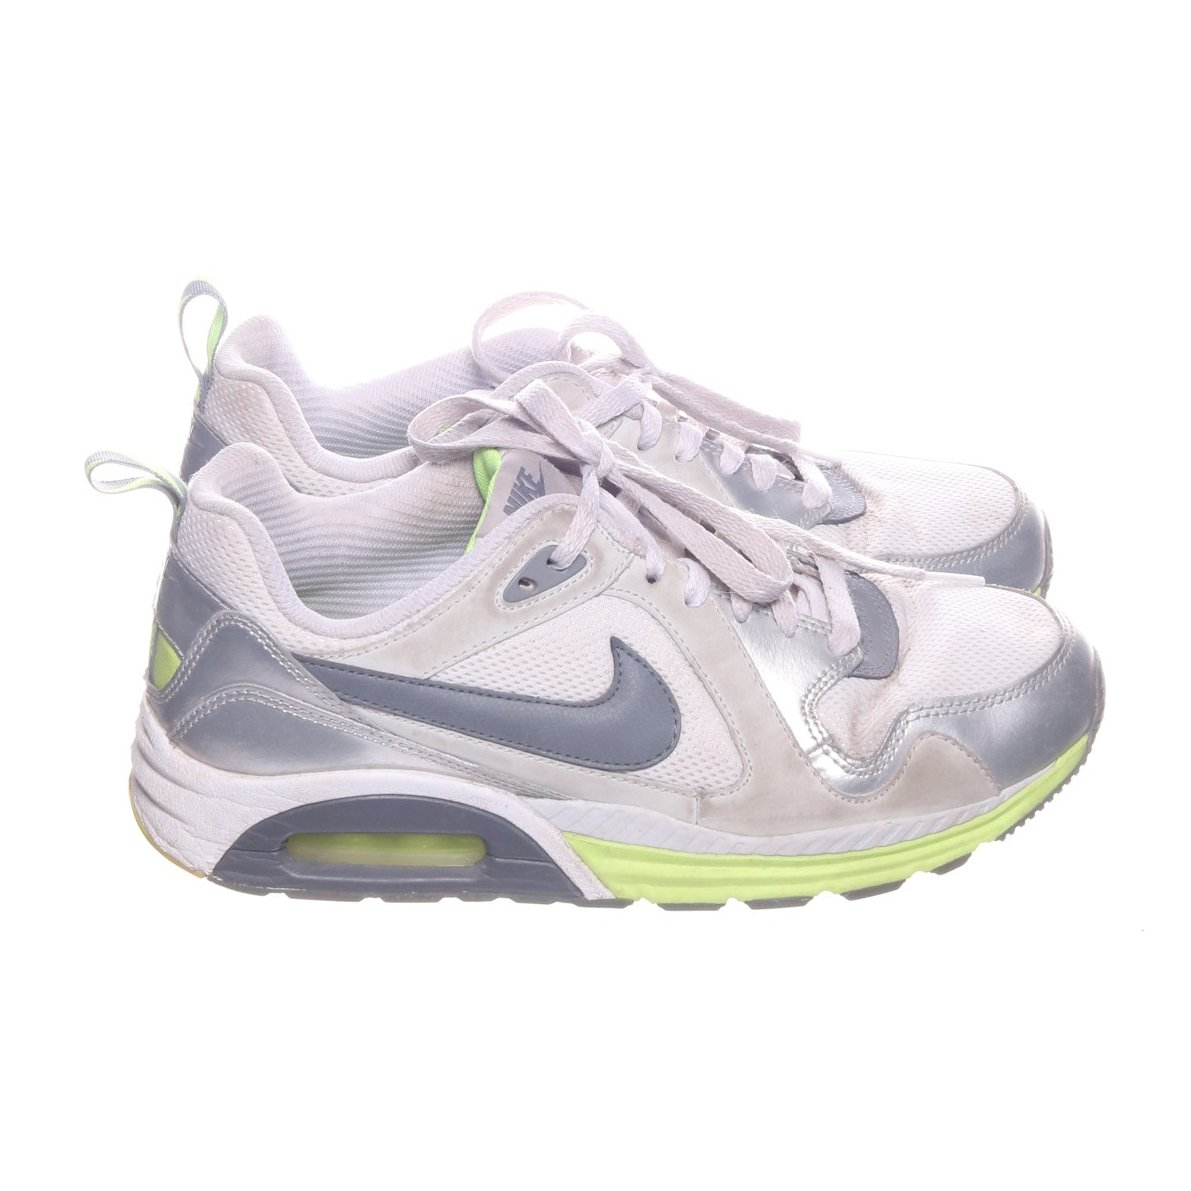 new styles 5bd00 21a12 Nike, Sneakers, Strl  40, Air max , Vit